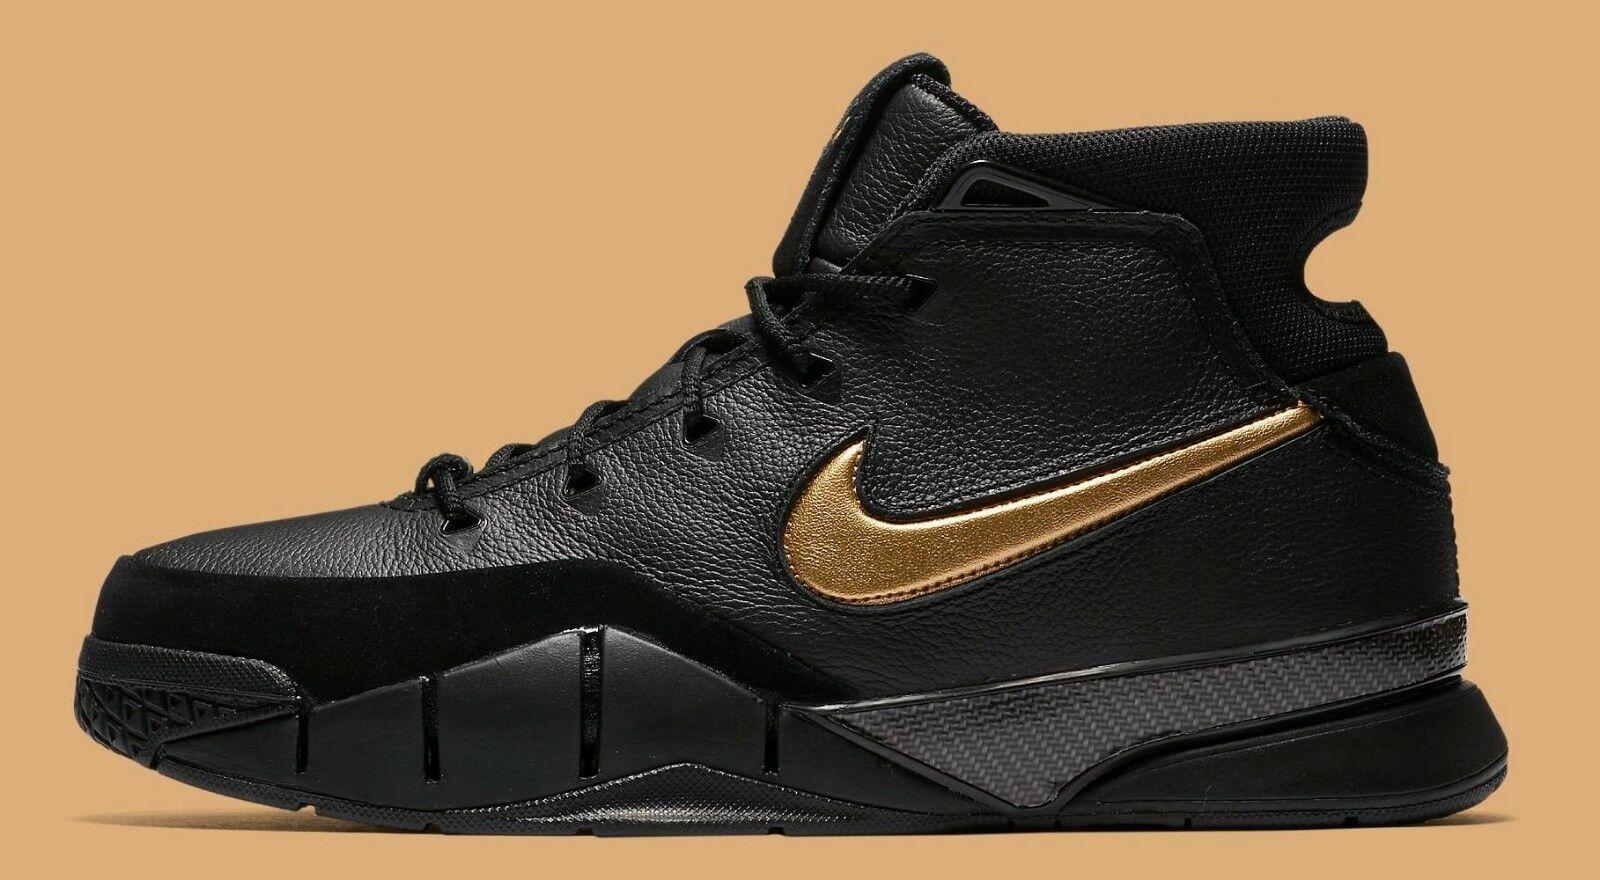 Nike Kobe 1 Predro Mamba Day Black gold Size 14. AQ2728-002.